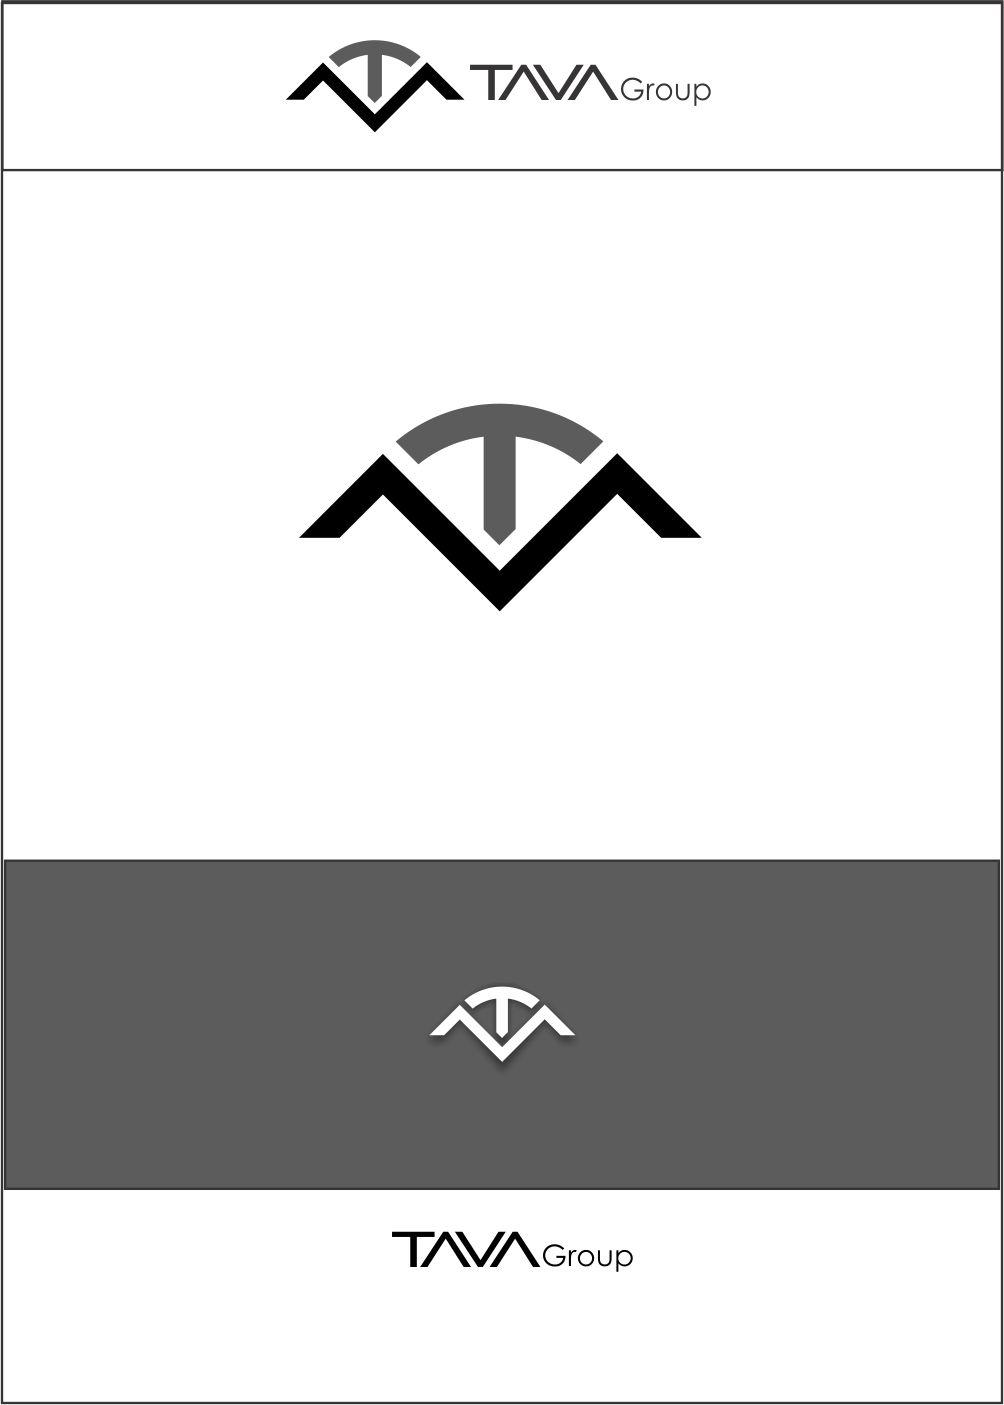 Logo Design by ian69 - Entry No. 154 in the Logo Design Contest Creative Logo Design for Tava Group.